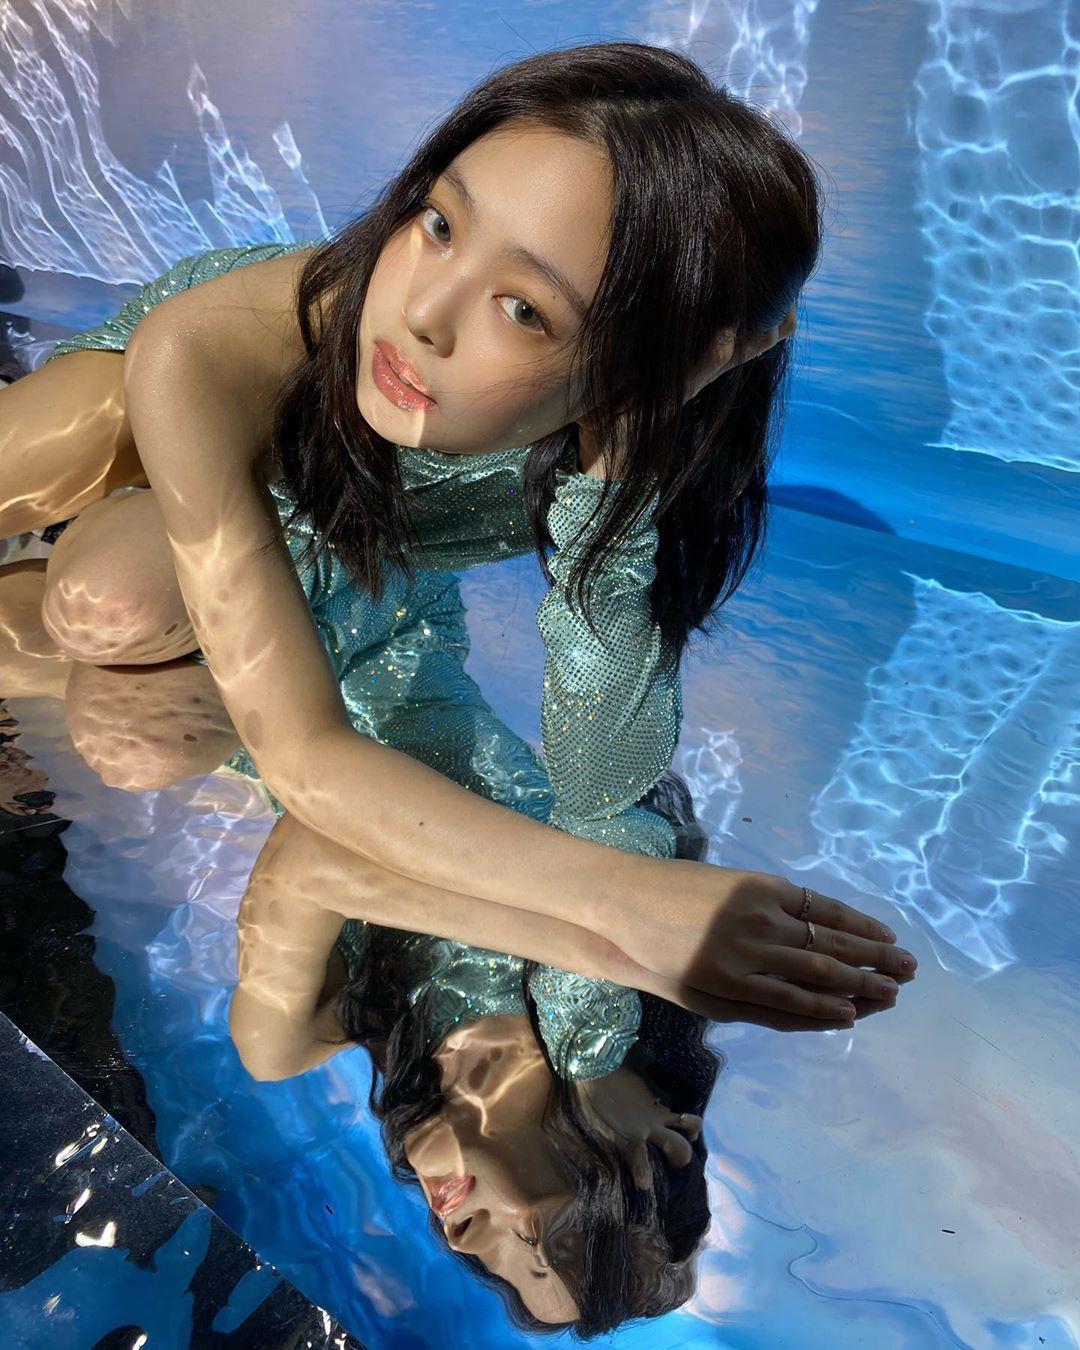 BLACKPINK的Lisa抓拍到了珍妮内心深处的美人鱼